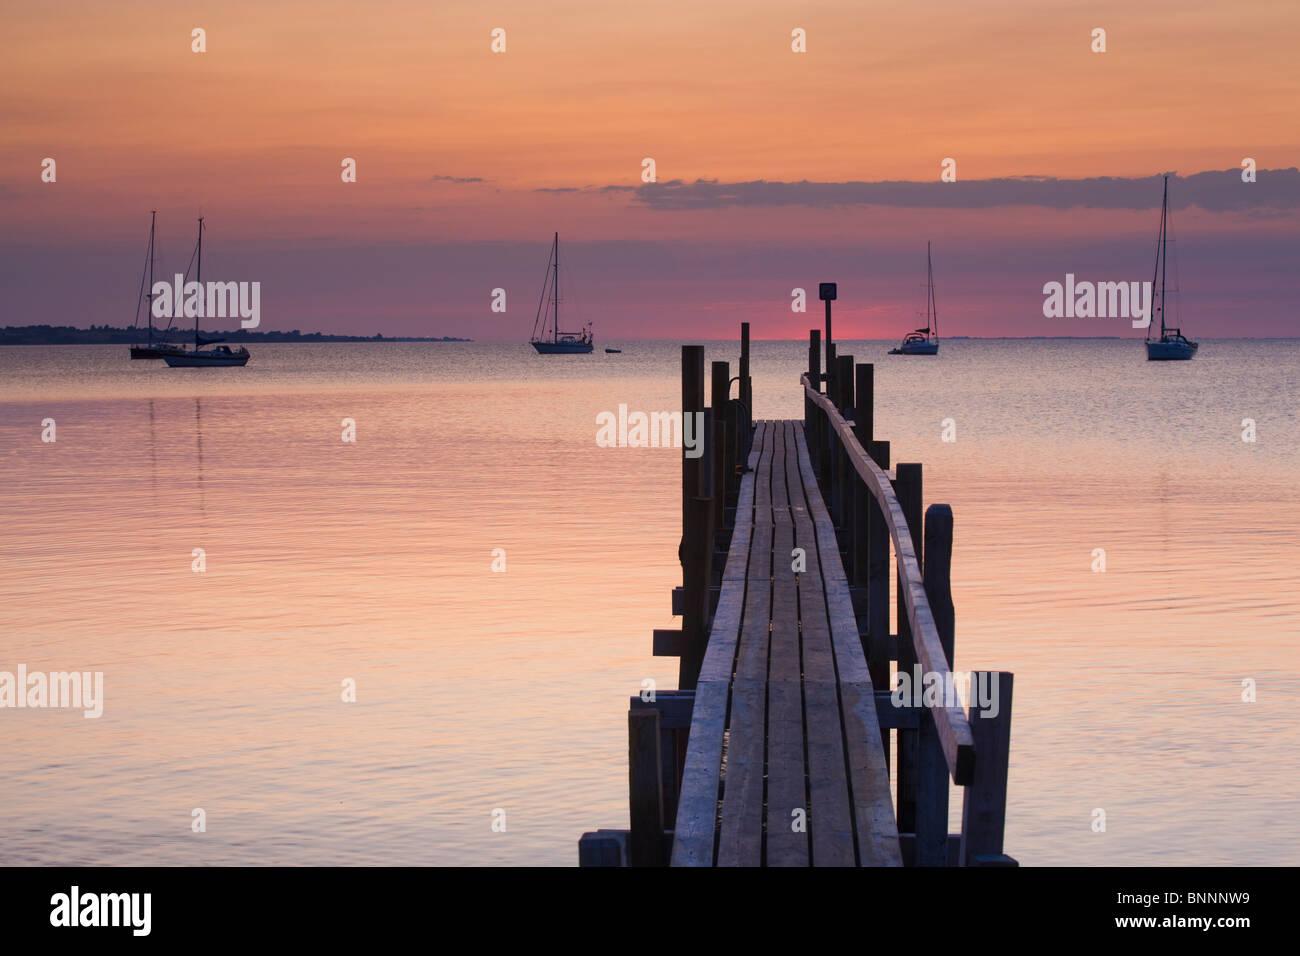 Aeroskobing Denmark island isle Aero beach seashore sea footbridge boats sailing ships sundown evening mood - Stock Image